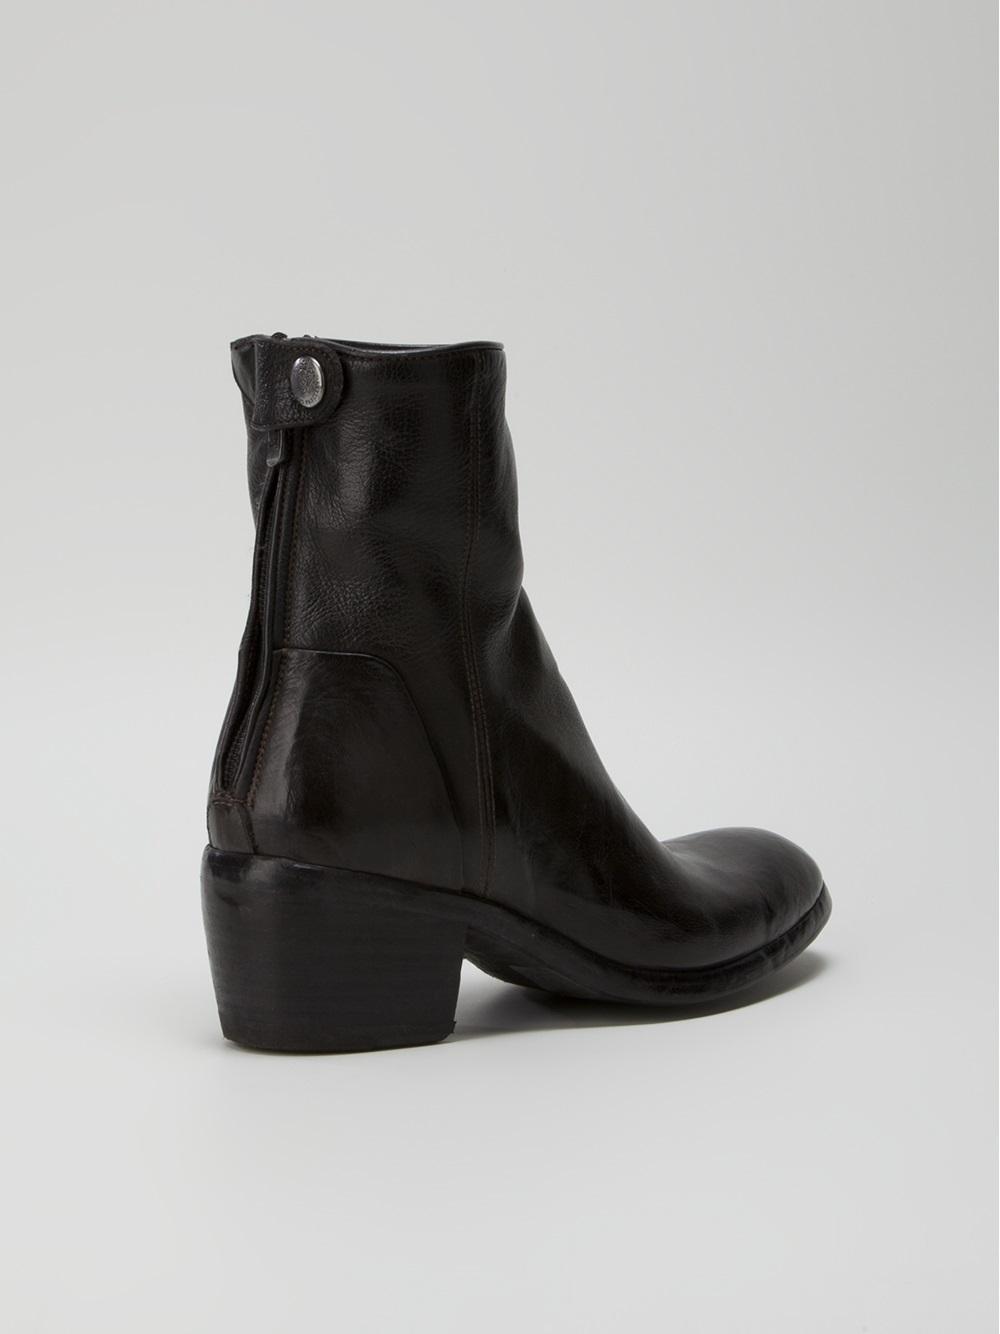 ALBERTO FASCIANI Ankle Boots iavkiHPss0